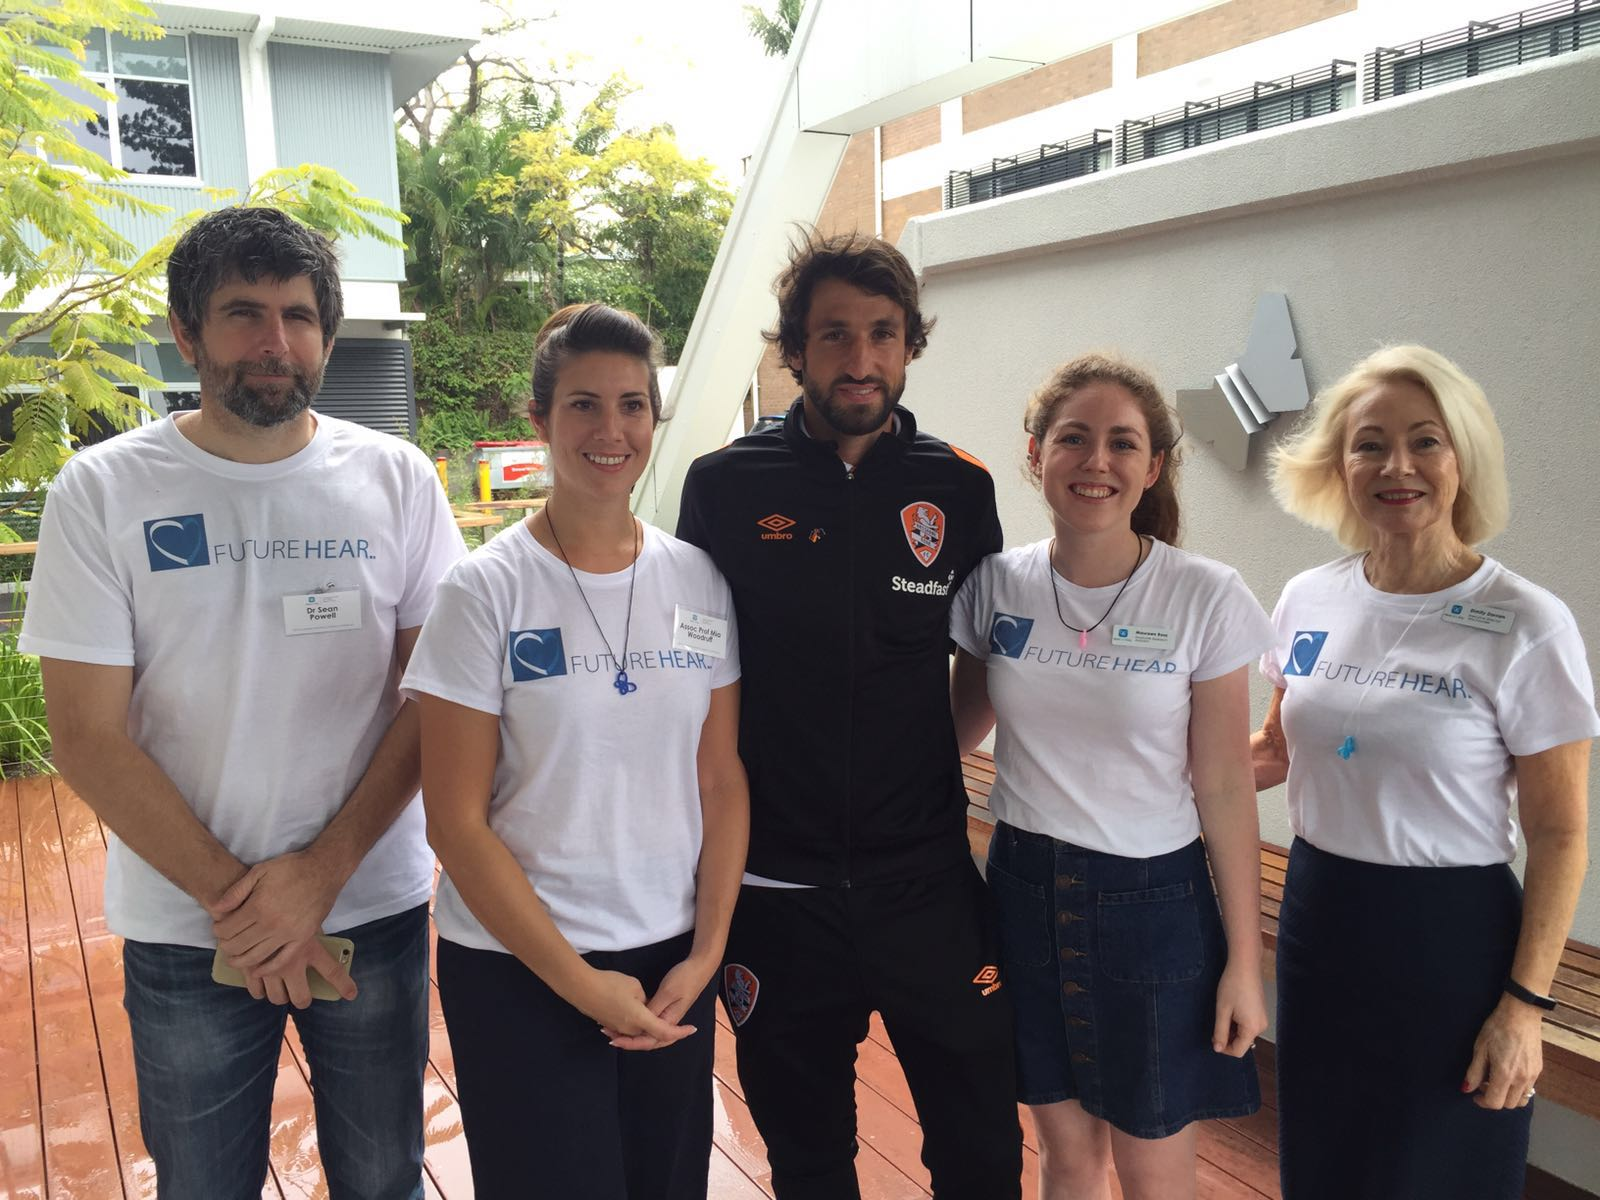 The FutureHear team with Thomas Broich of the Brisbane Roar